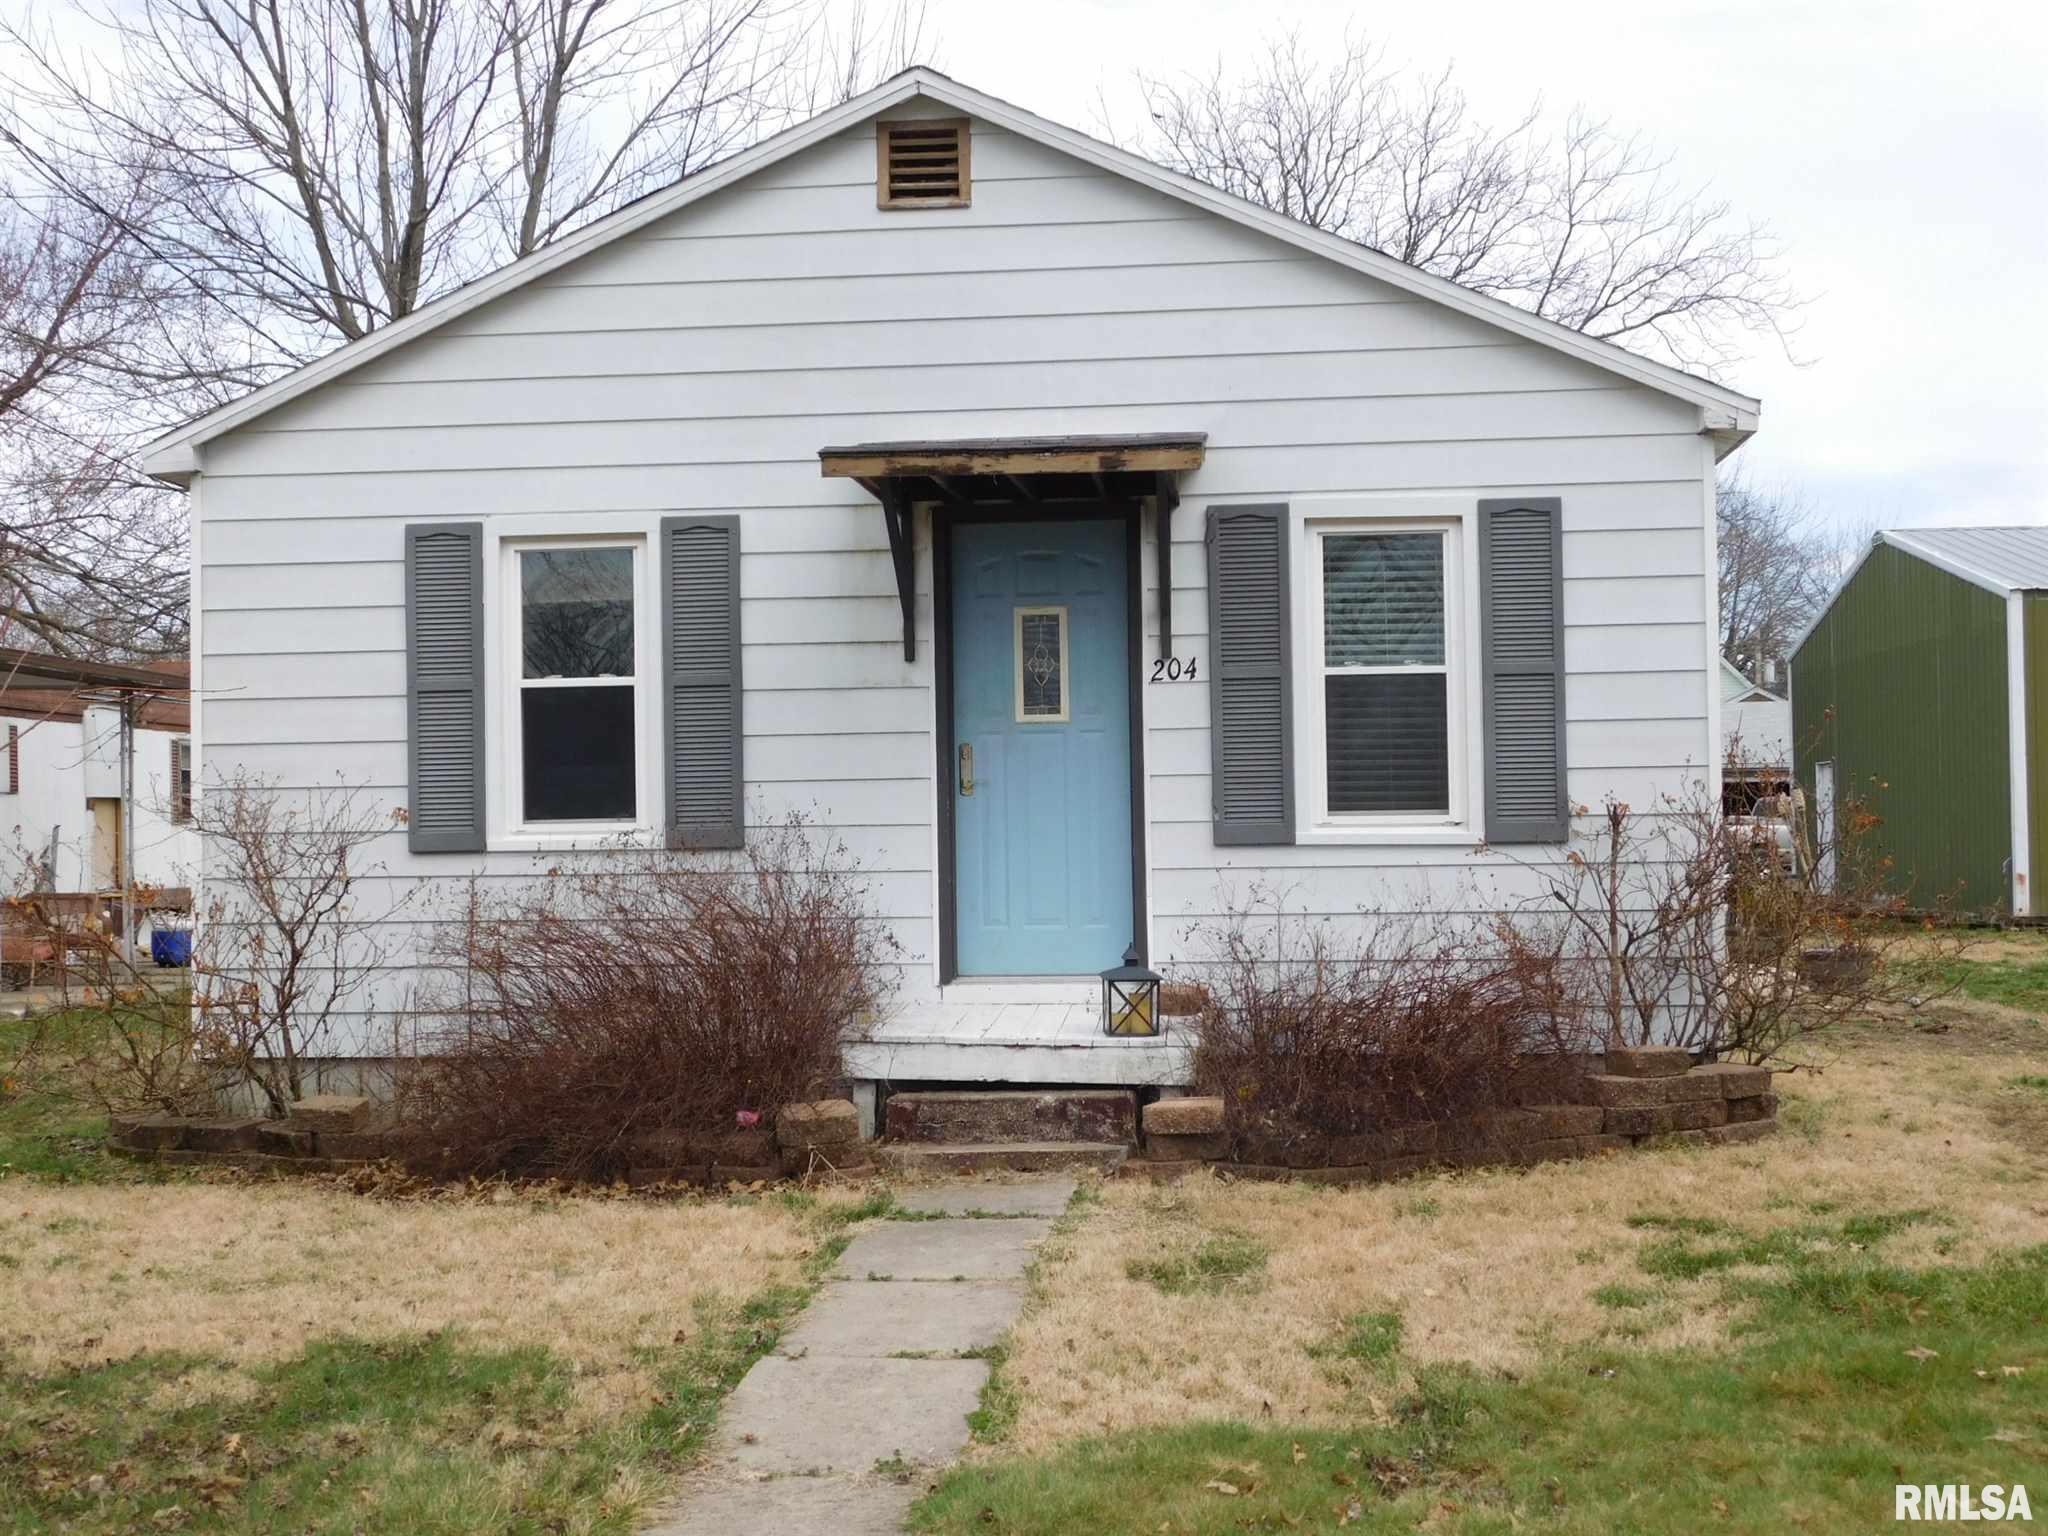 204 S MAPLE Property Photo - Sandoval, IL real estate listing